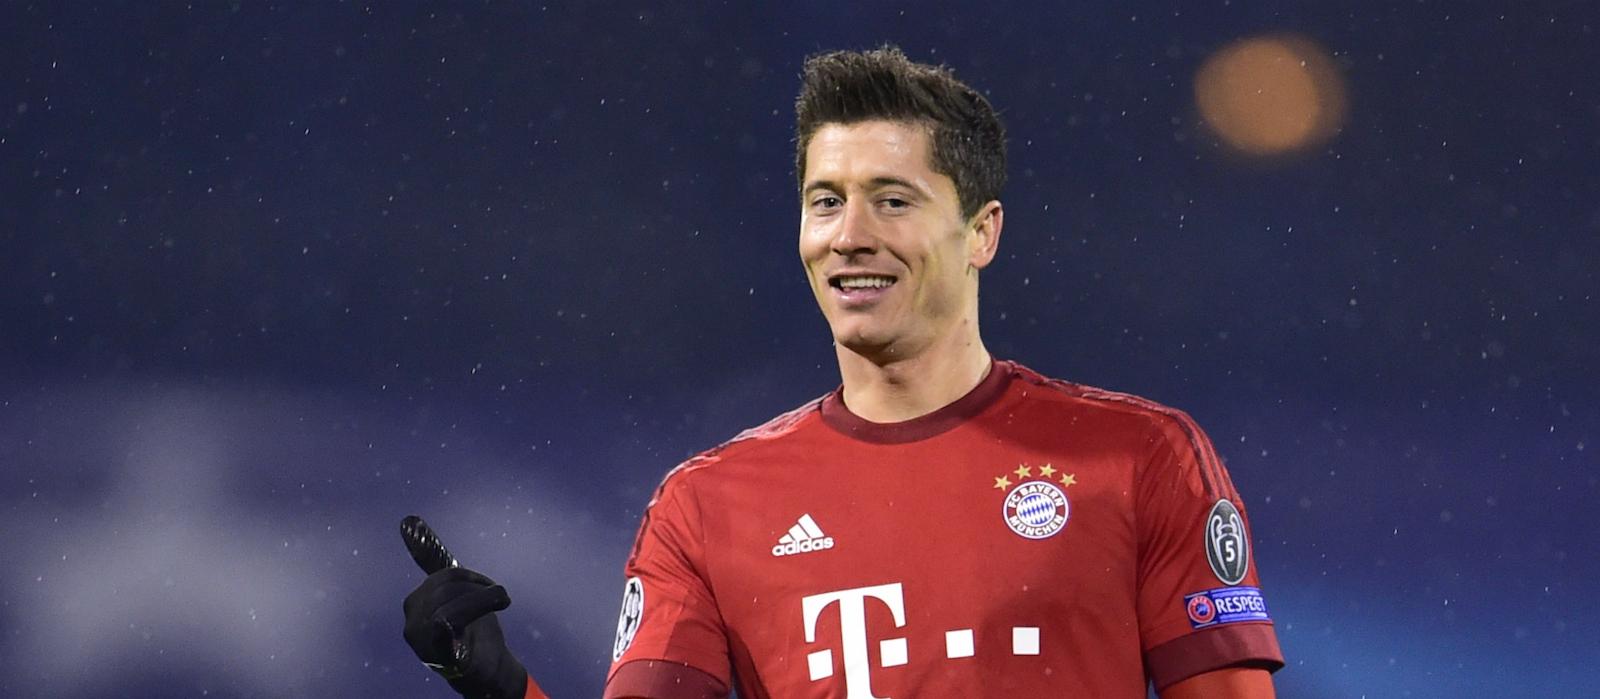 BREAKING: Lewandowski to Man. United, Smuda confirms